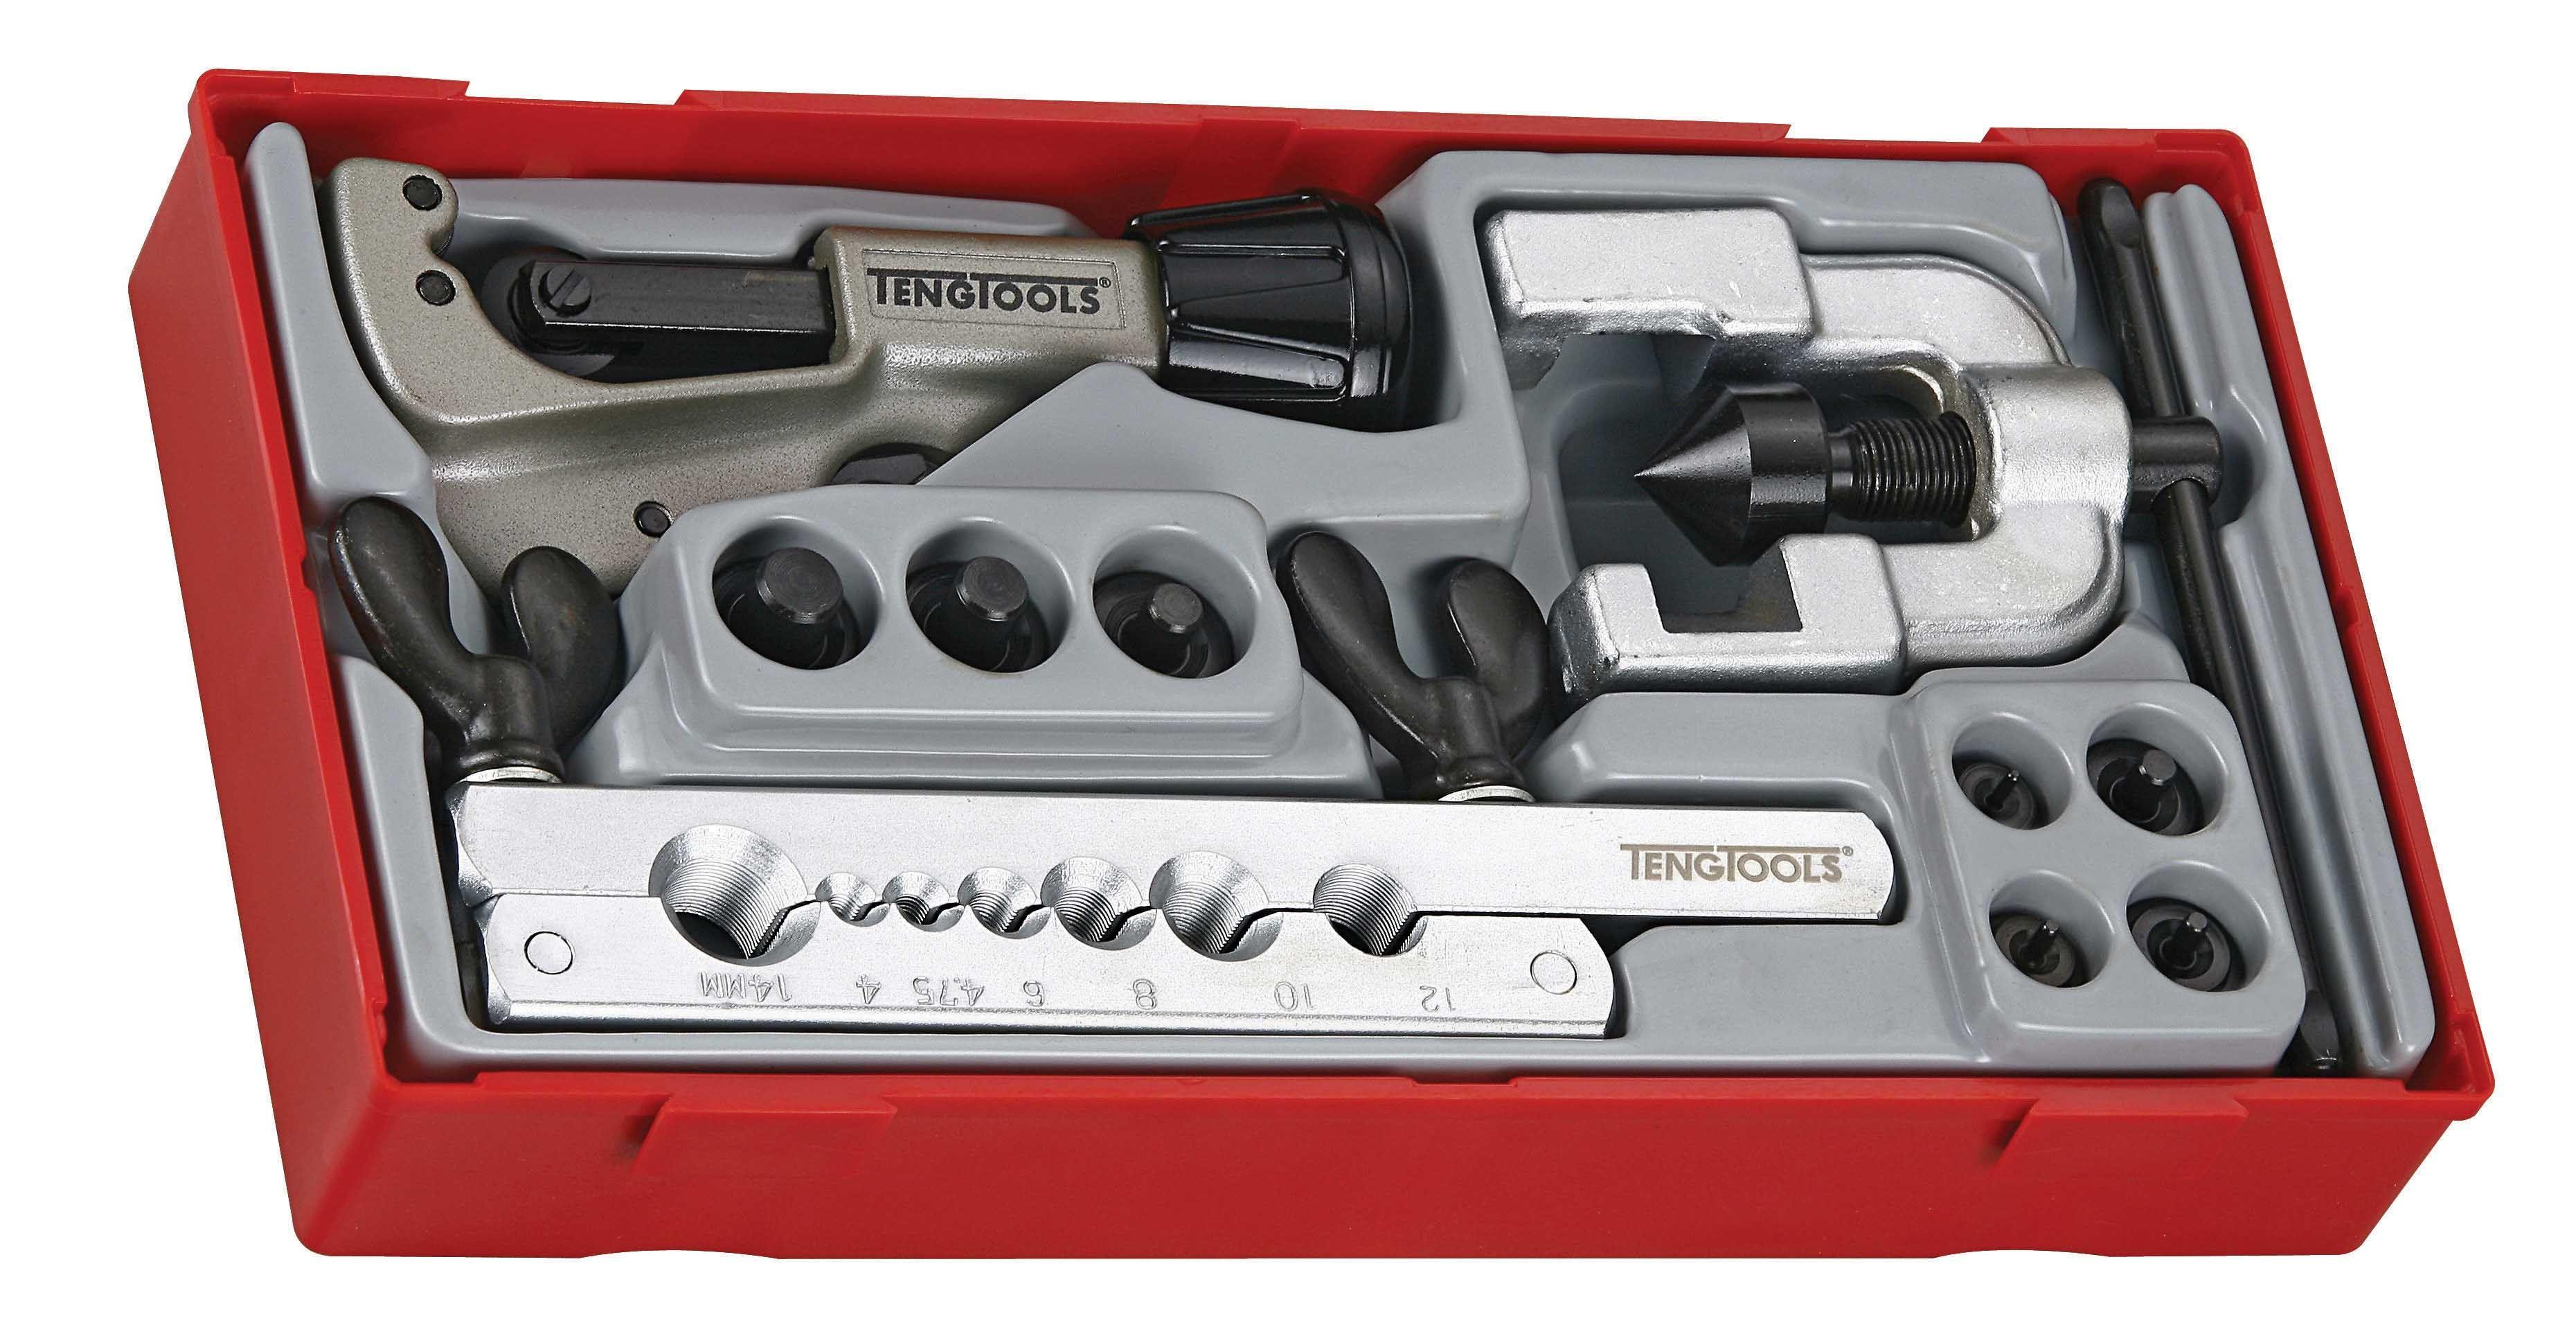 Teng Tools 10 Piece Tube Flaring Tool Set